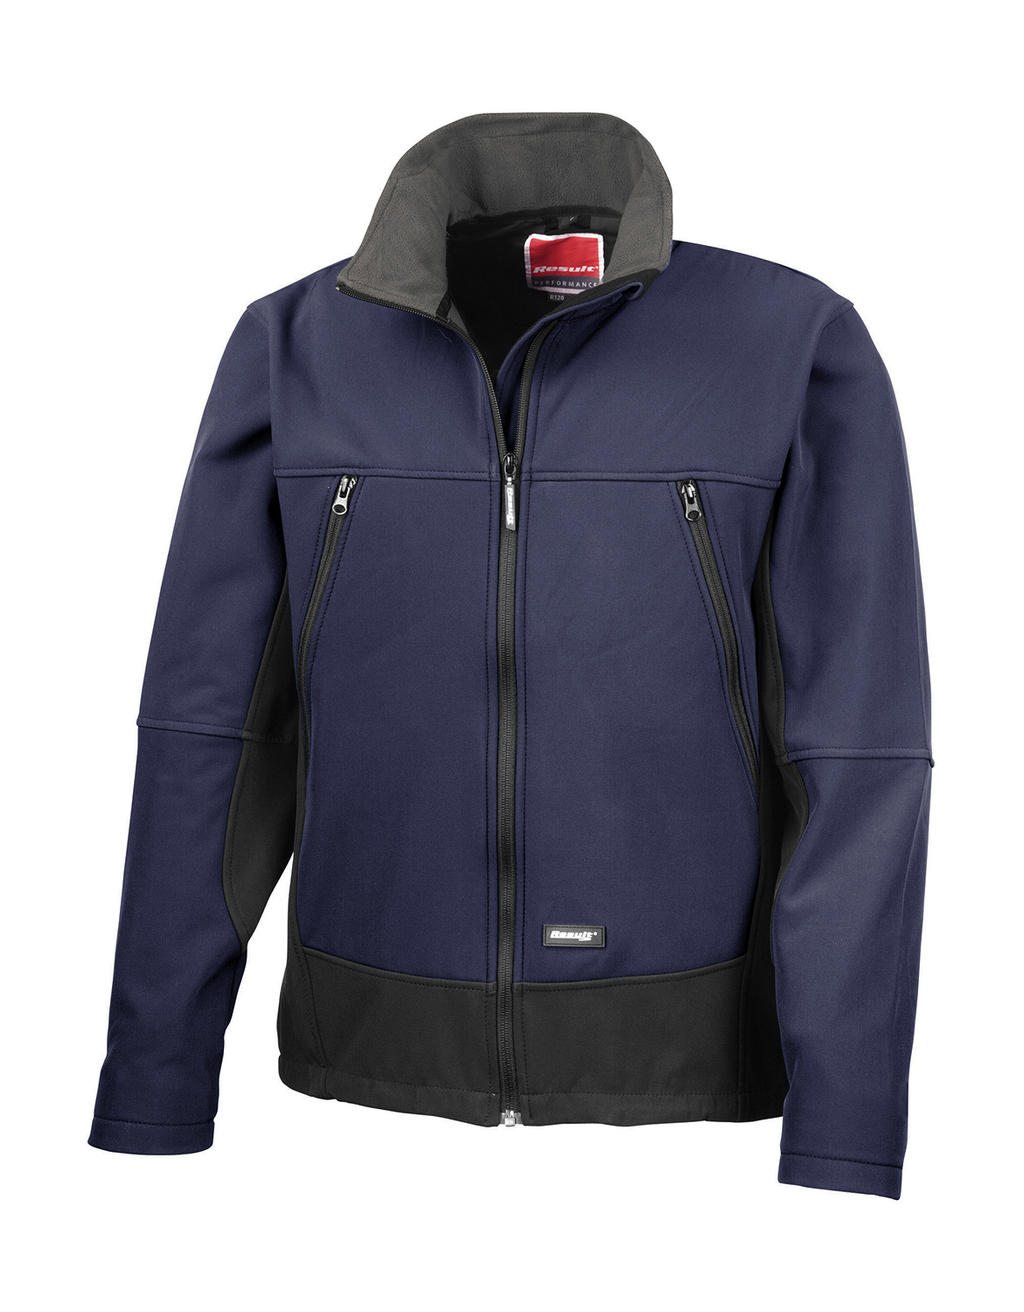 Softshell Activity Jacket